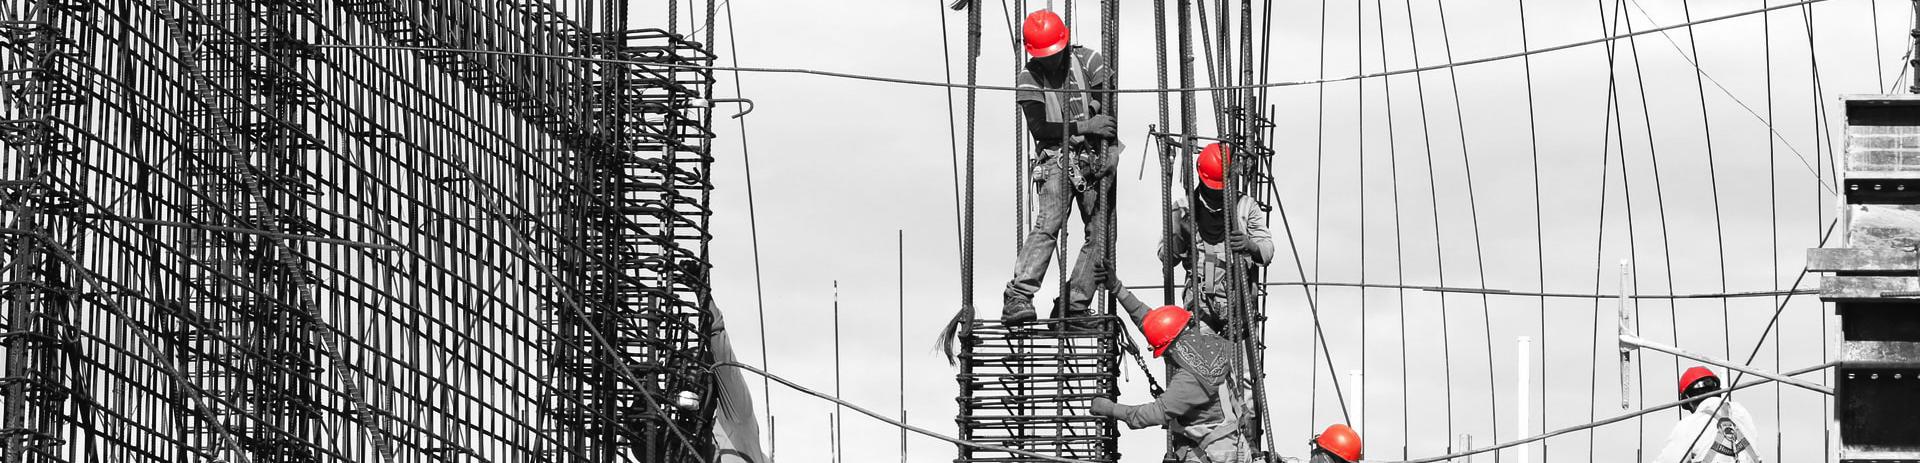 Toename aantal arbeidsongevallen | LetselPro